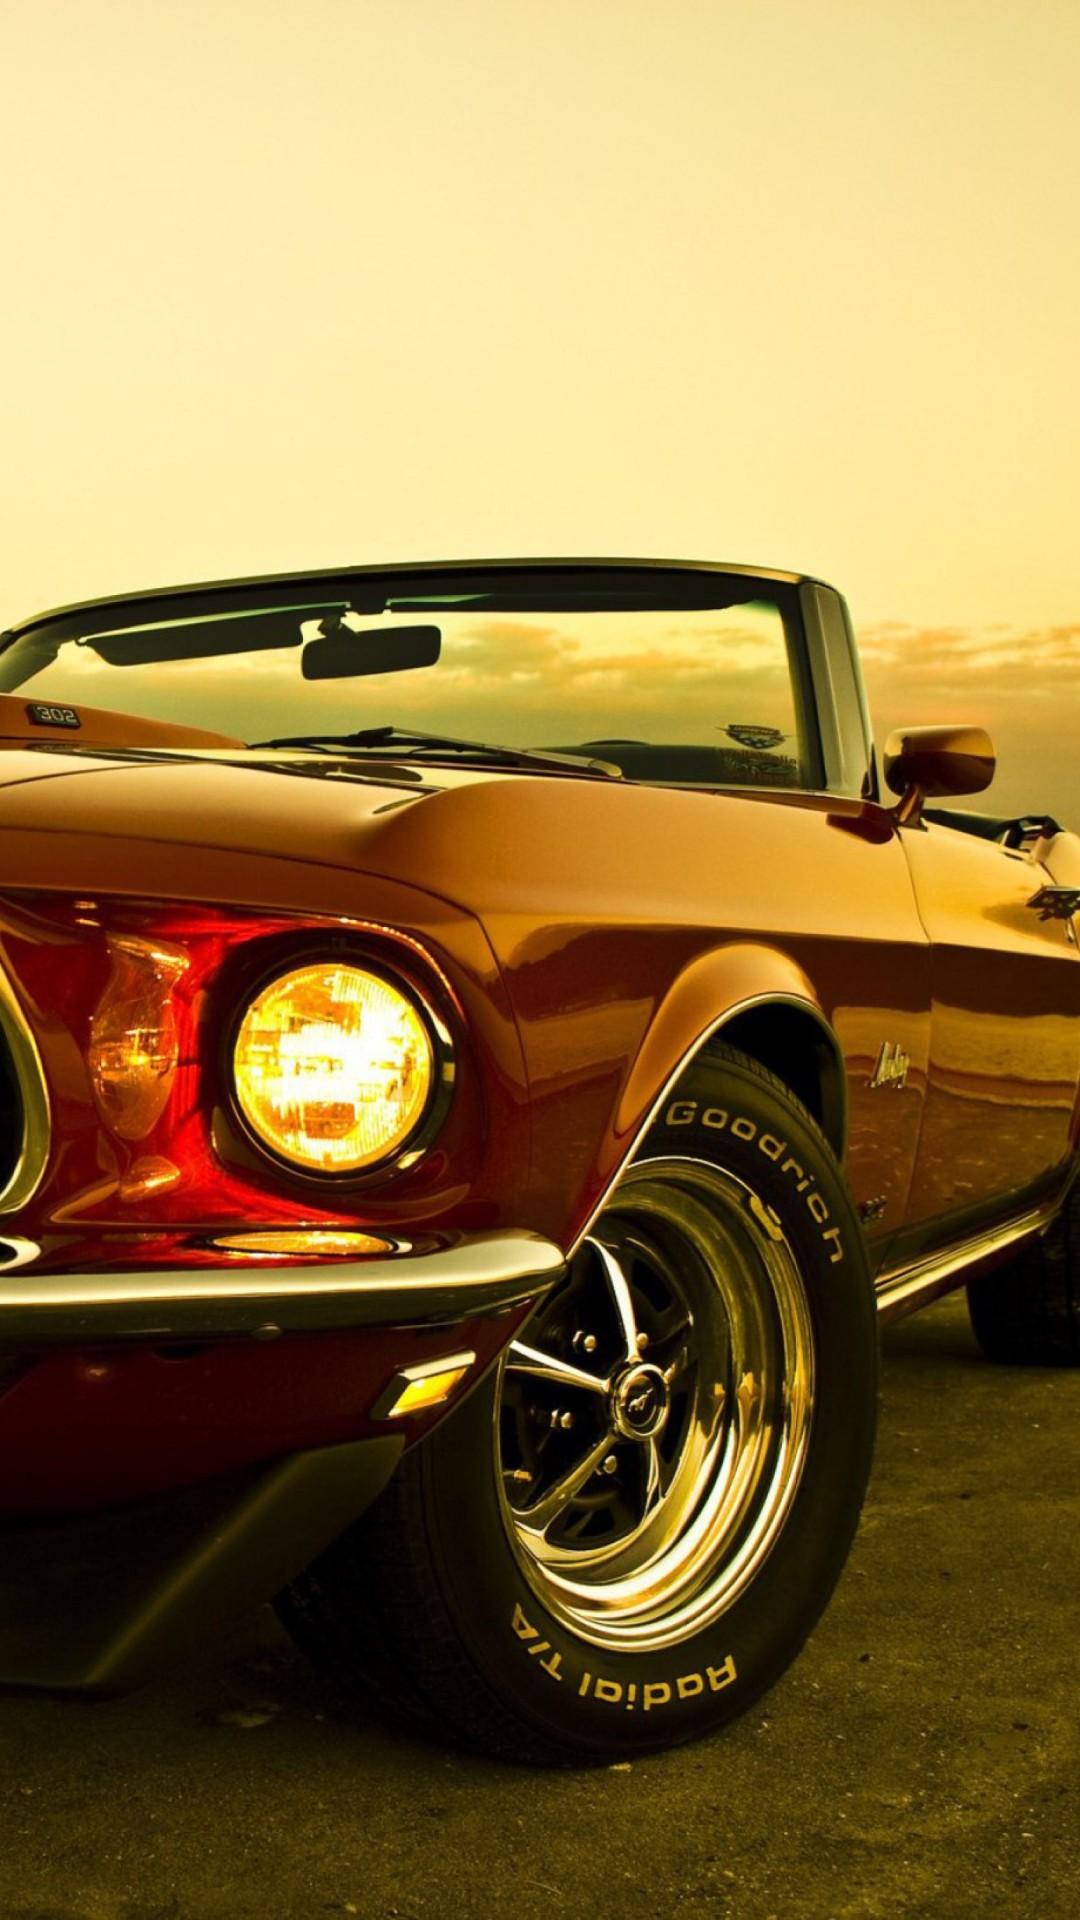 1969 Mustang Boss 302 Wallpaper